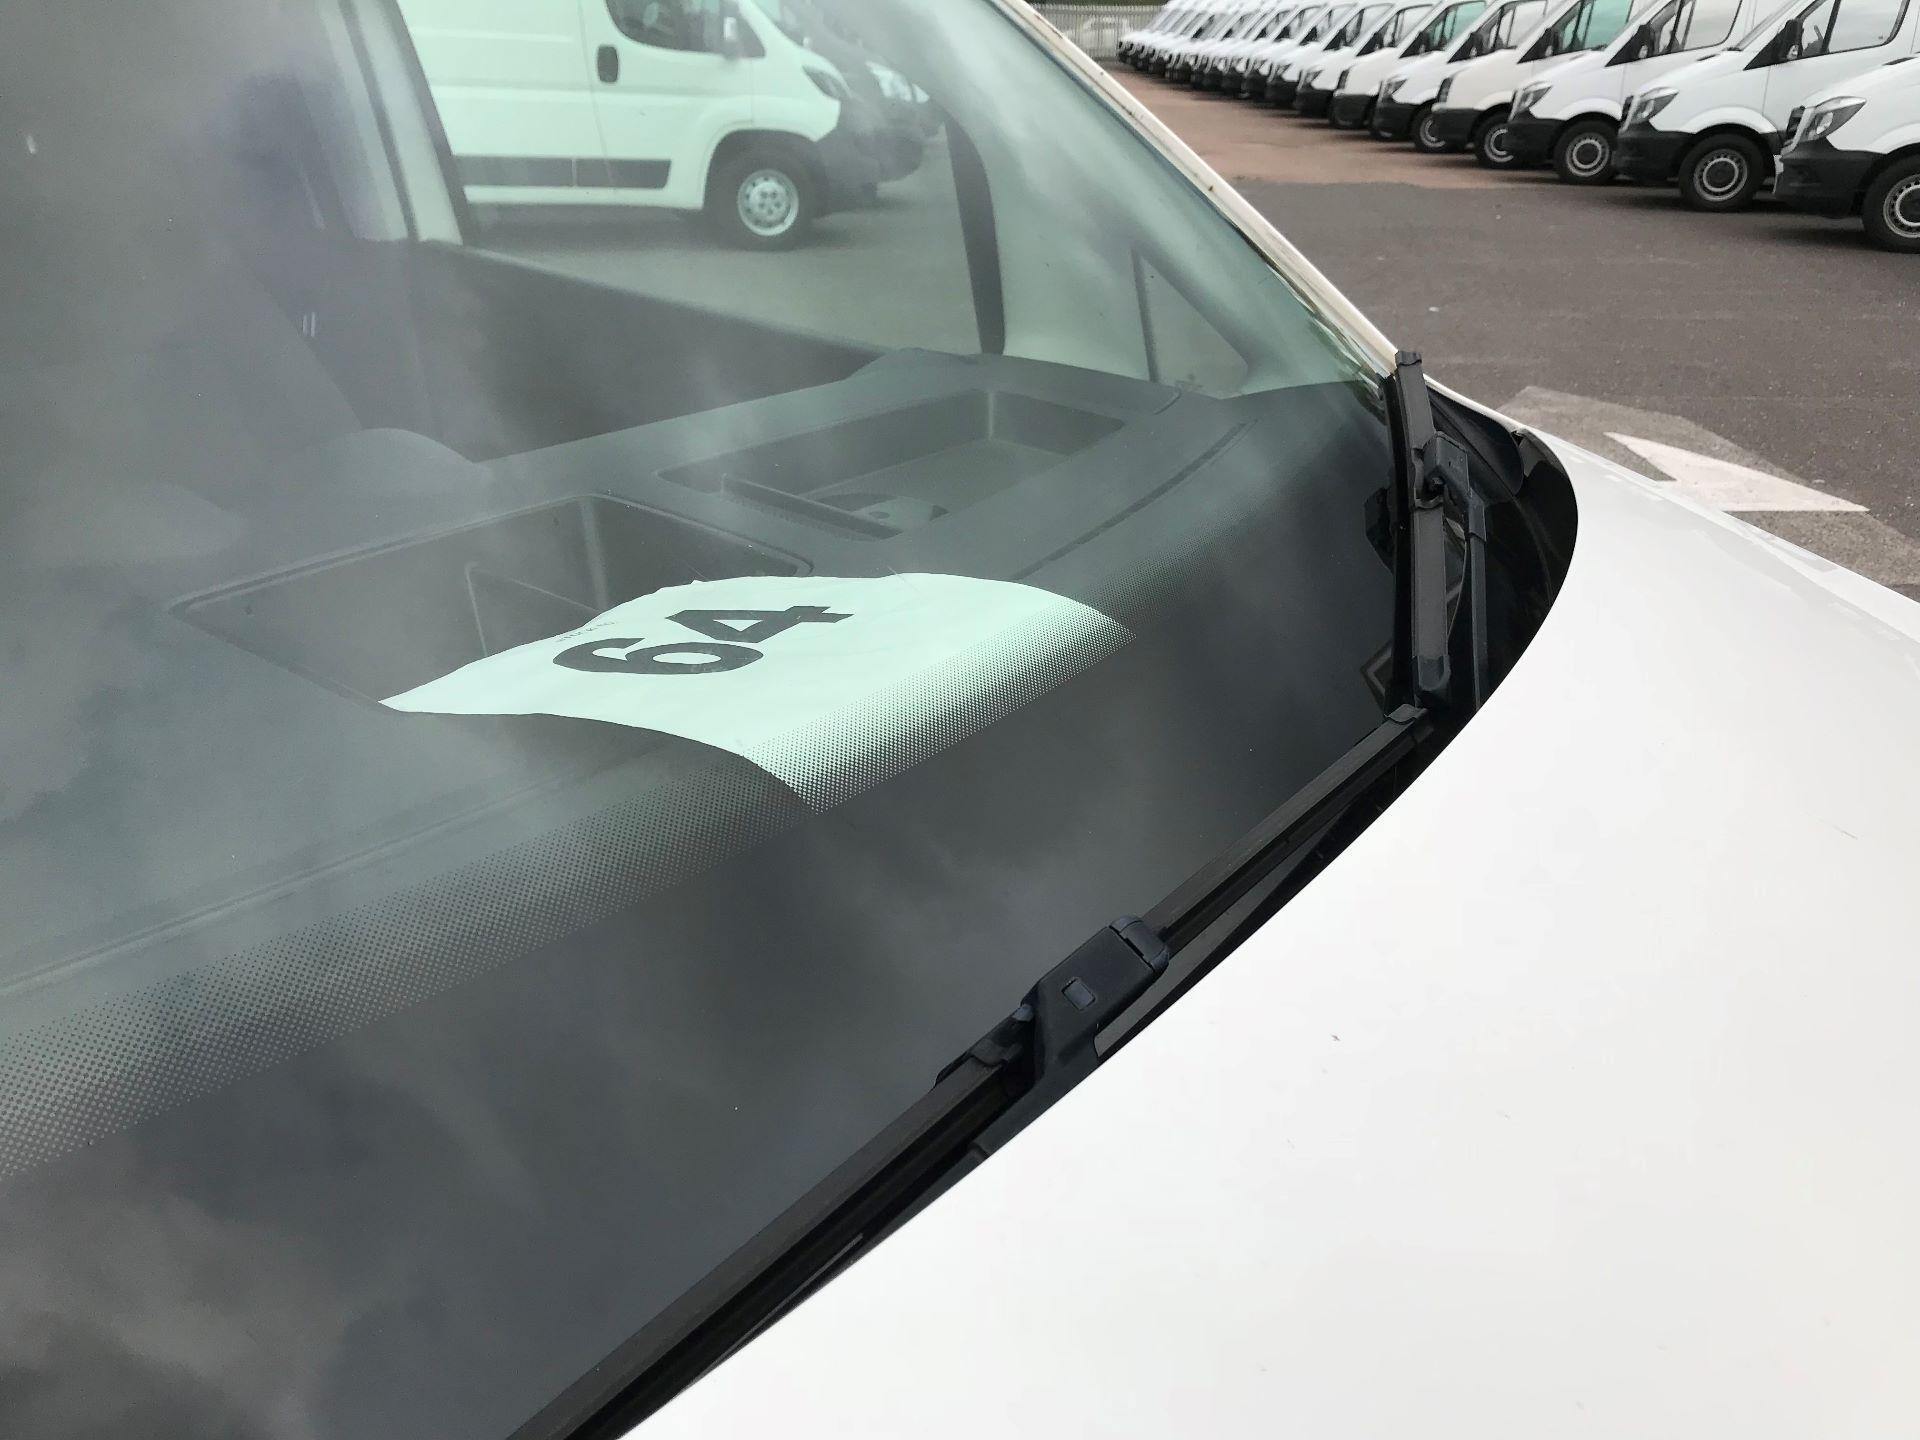 2014 Volkswagen Caddy   1.6 75PS   STARTLINE EURO 5 (DY64BUA) Image 15